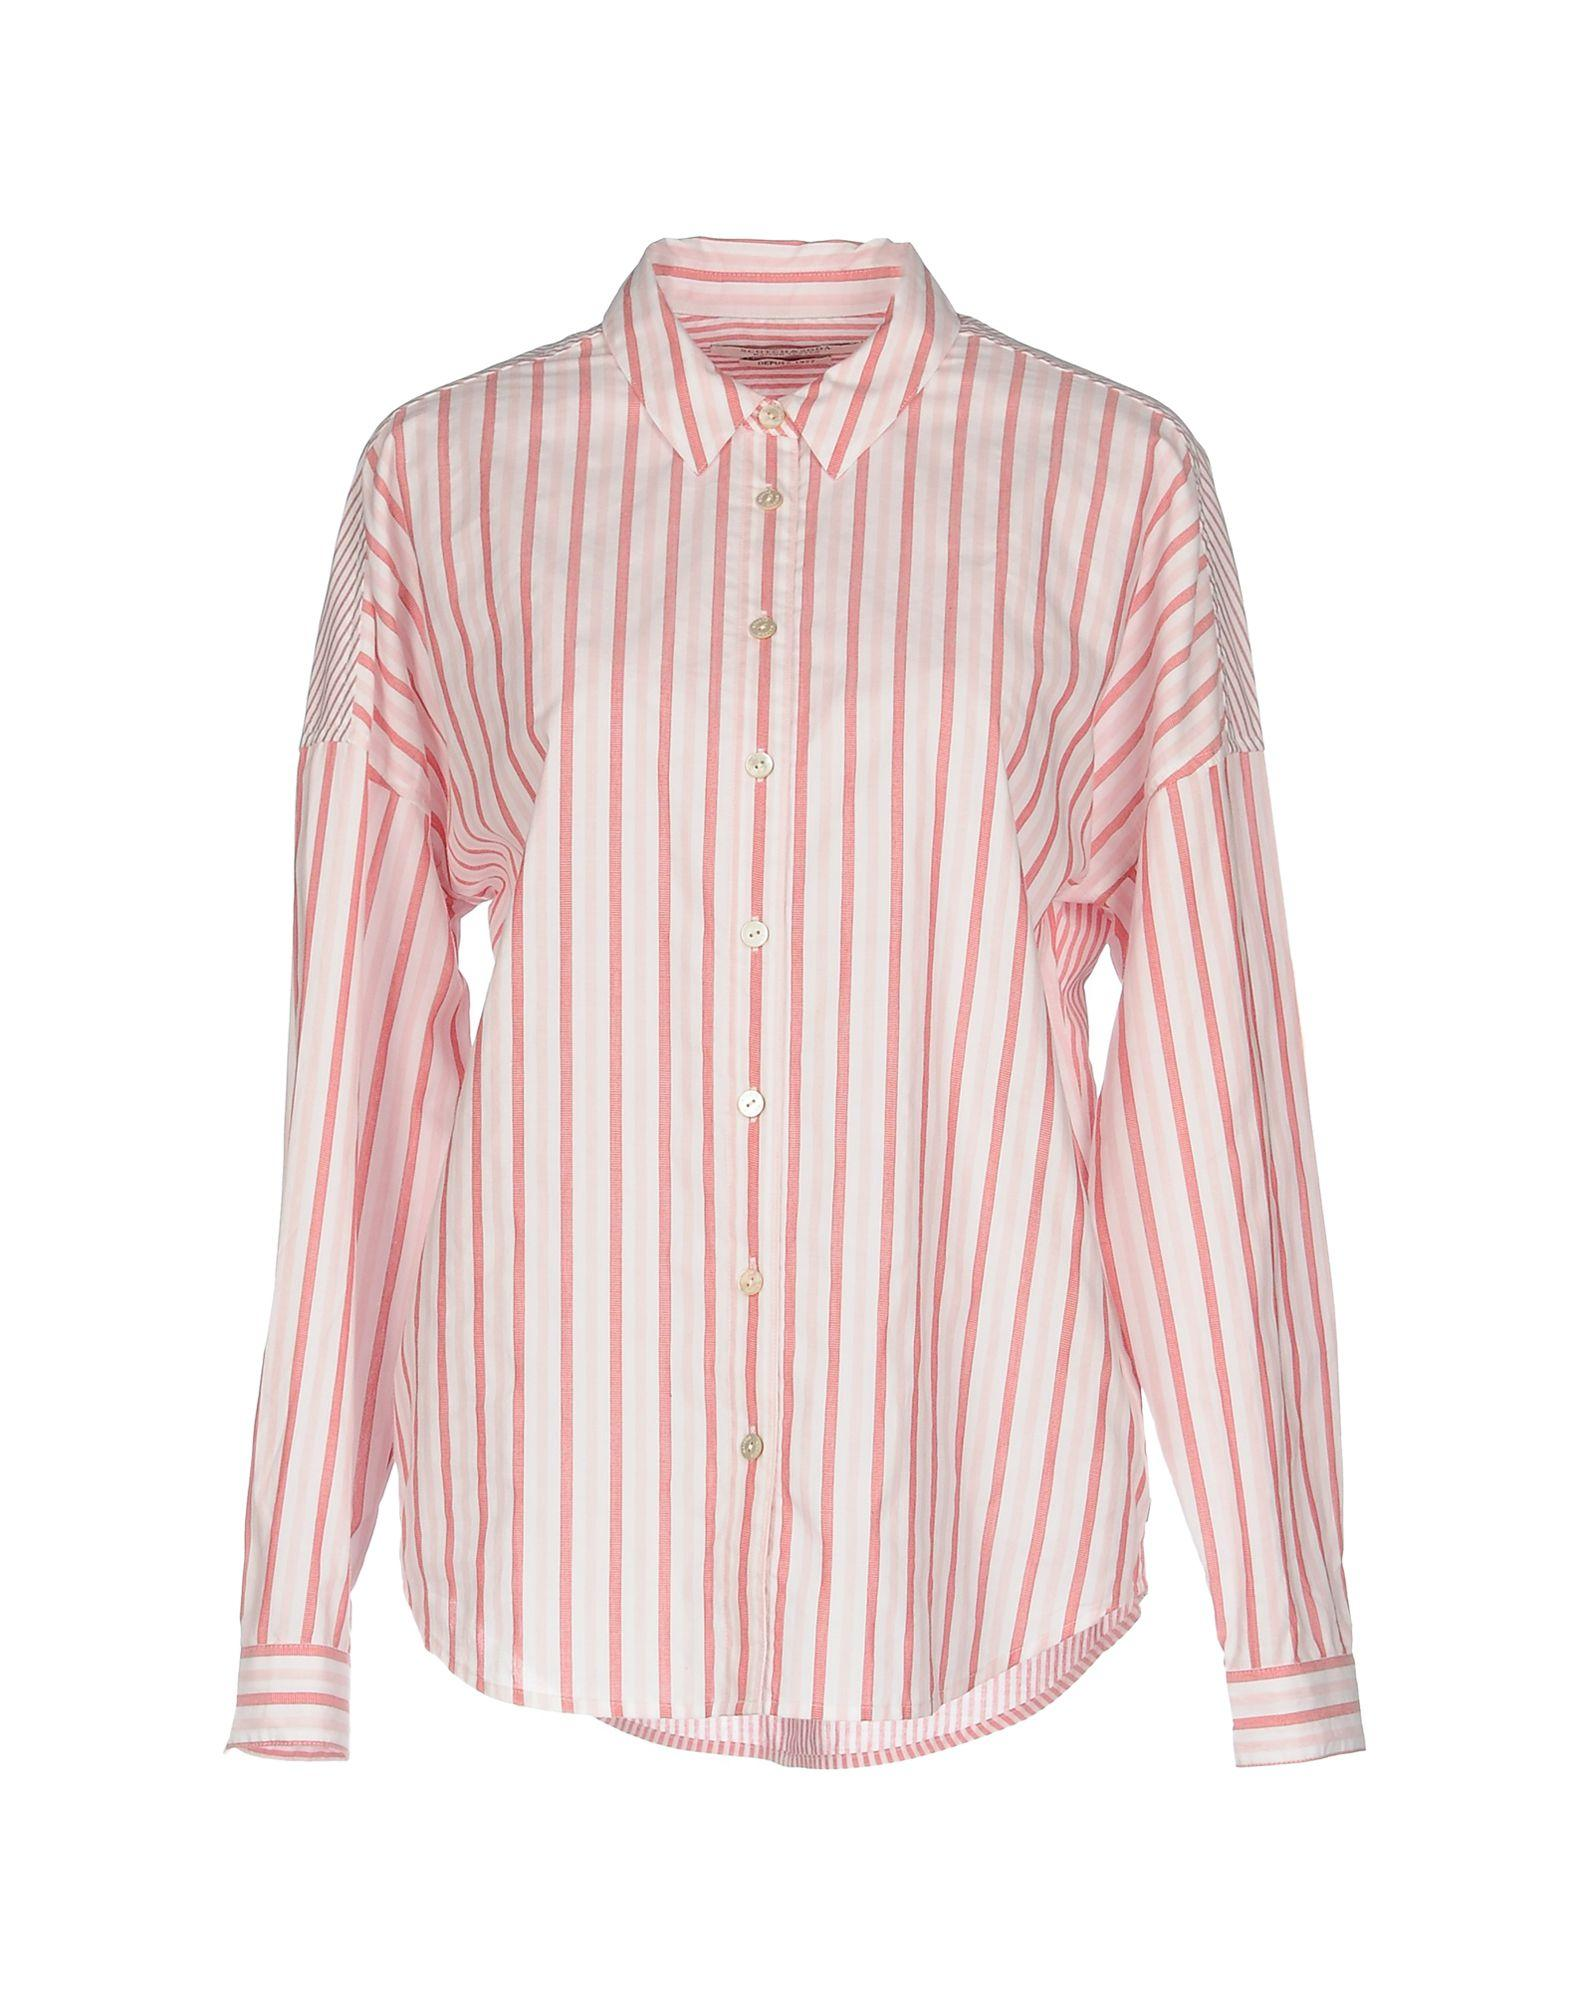 Maison Scotch Shirts In Pink